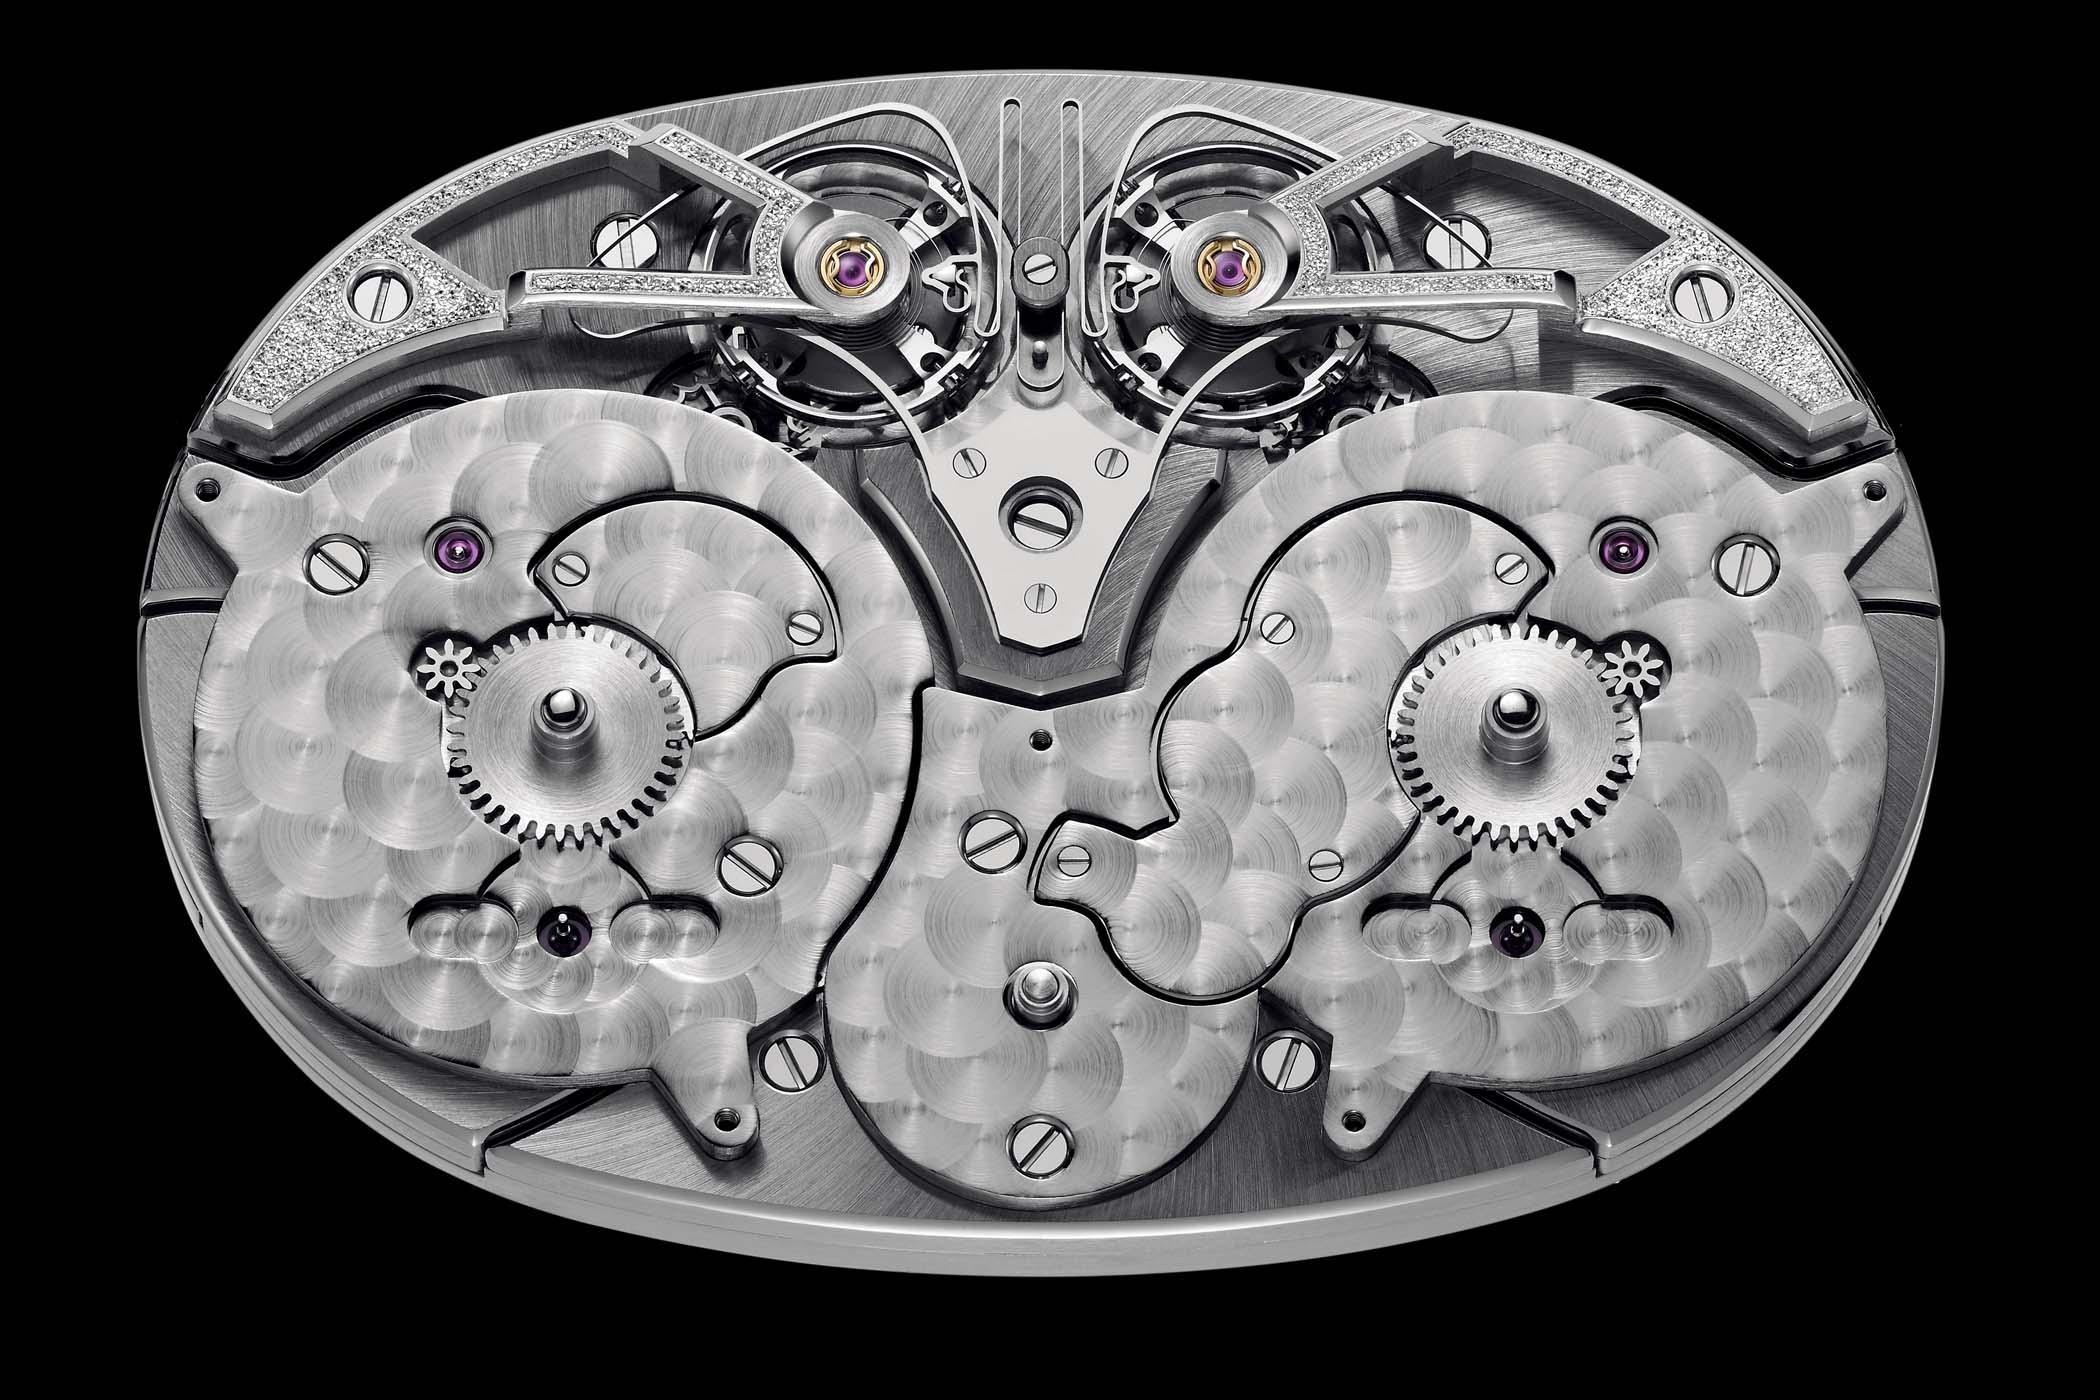 Armin Strom Dual Time Resonance Sapphire SIHH 2019 - 2